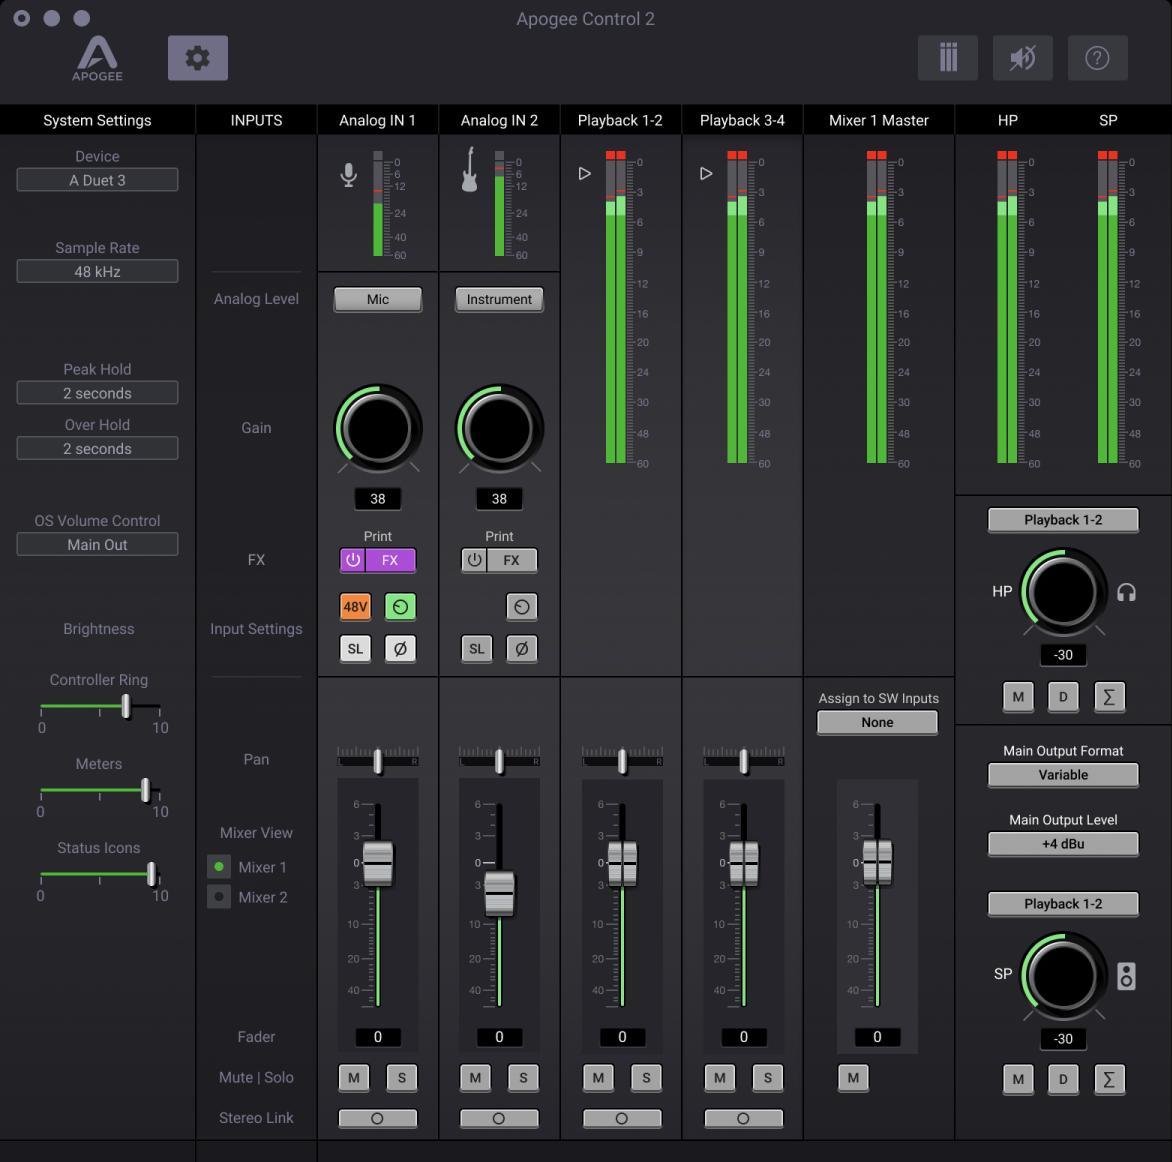 Duet-3-Apogee-Control-2-Software.png.jpg